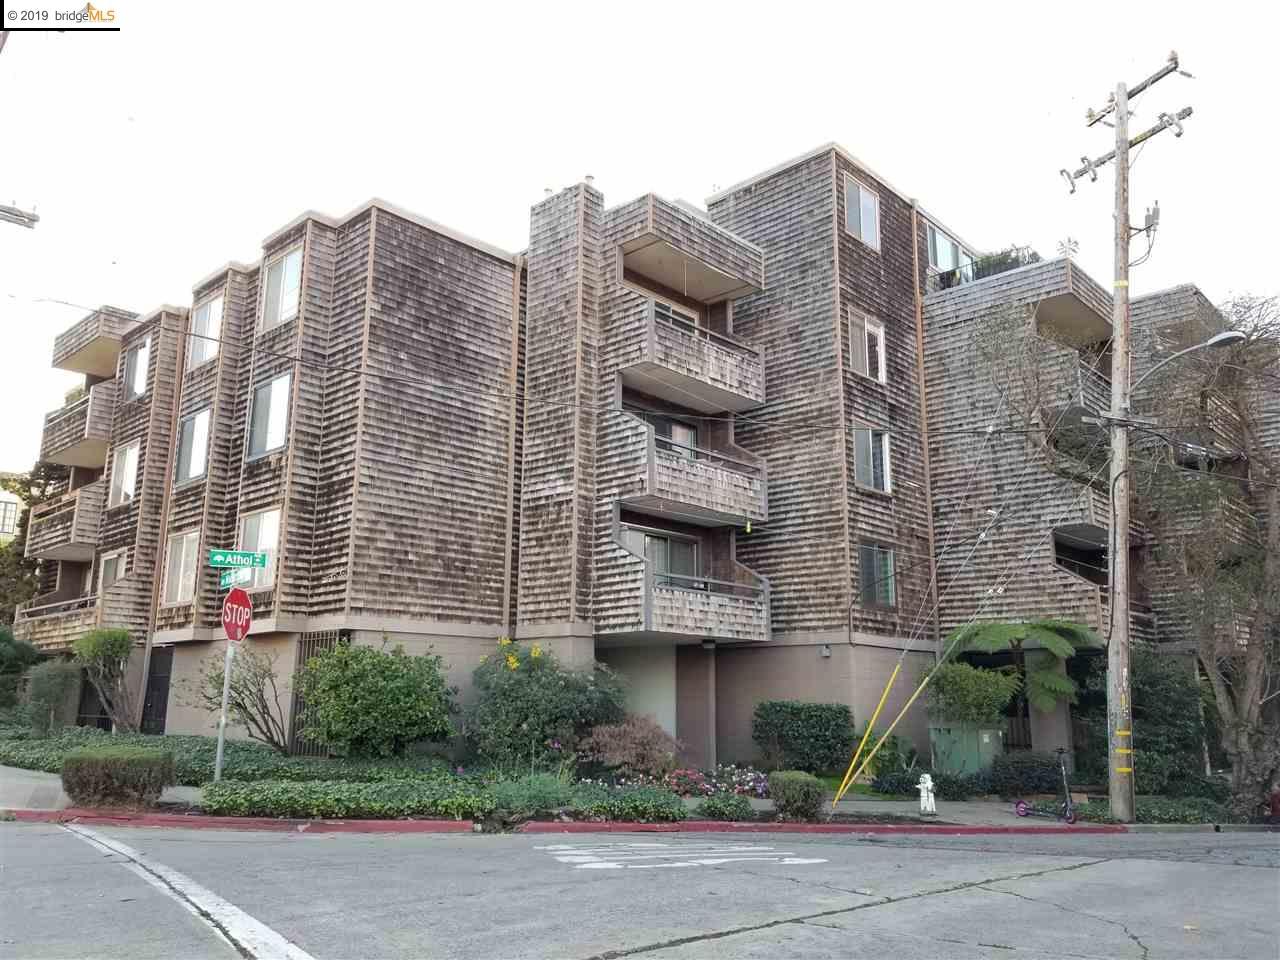 696 #303 Athol Ave Oakland, CA 94610